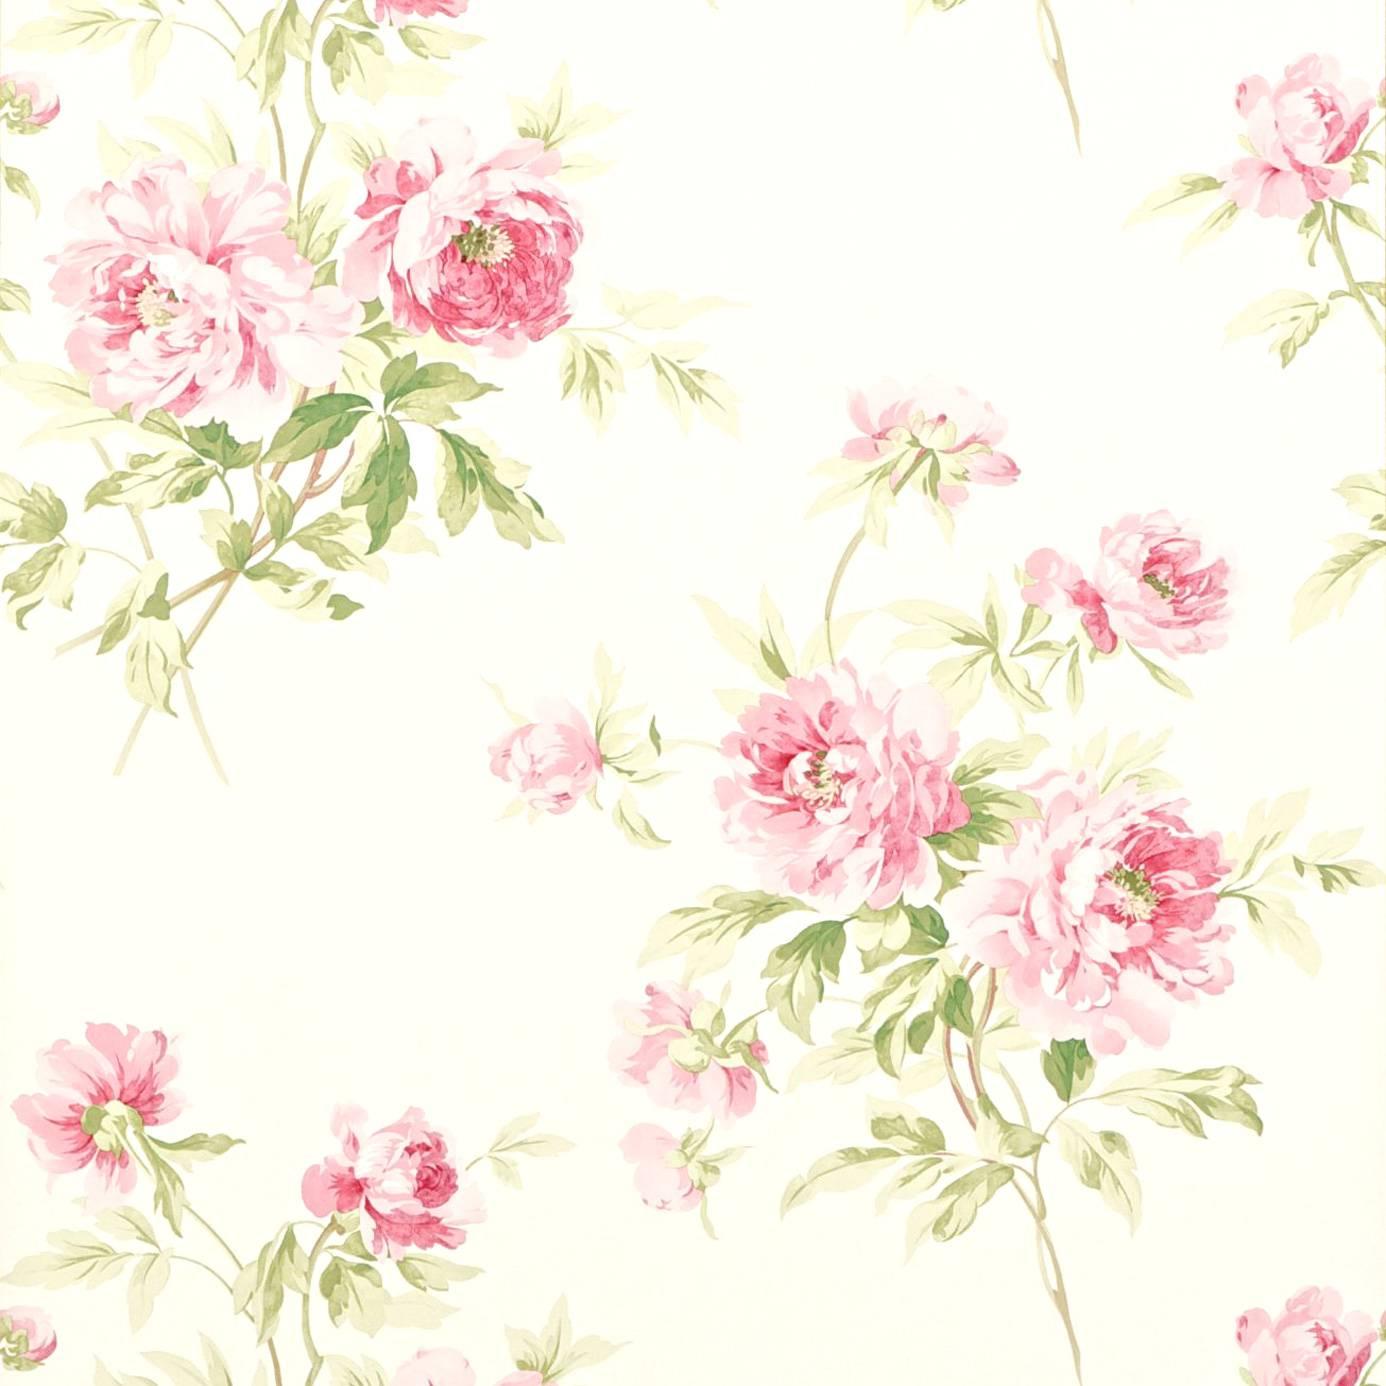 Adele Wallpaper RoseCream DCAVAD101 Sanderson